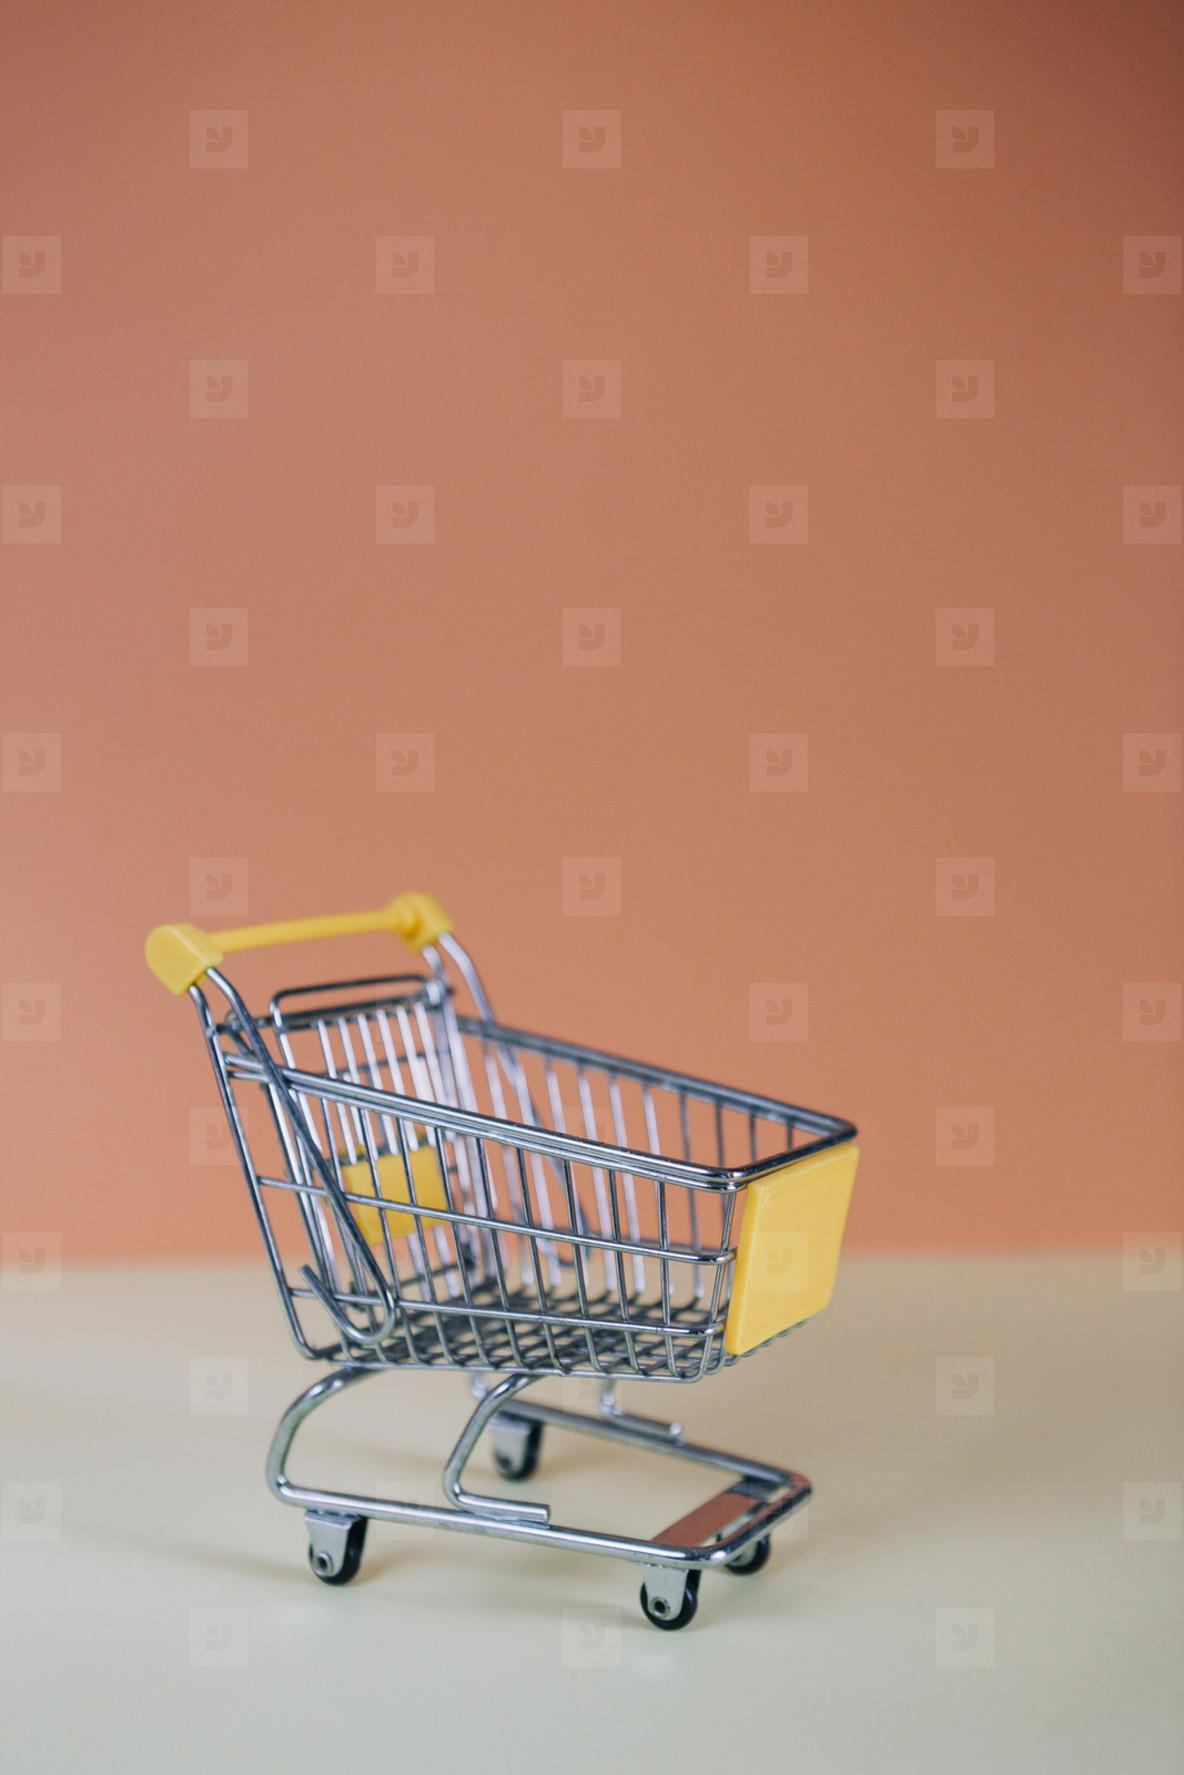 Tiny toy shopping cart 04